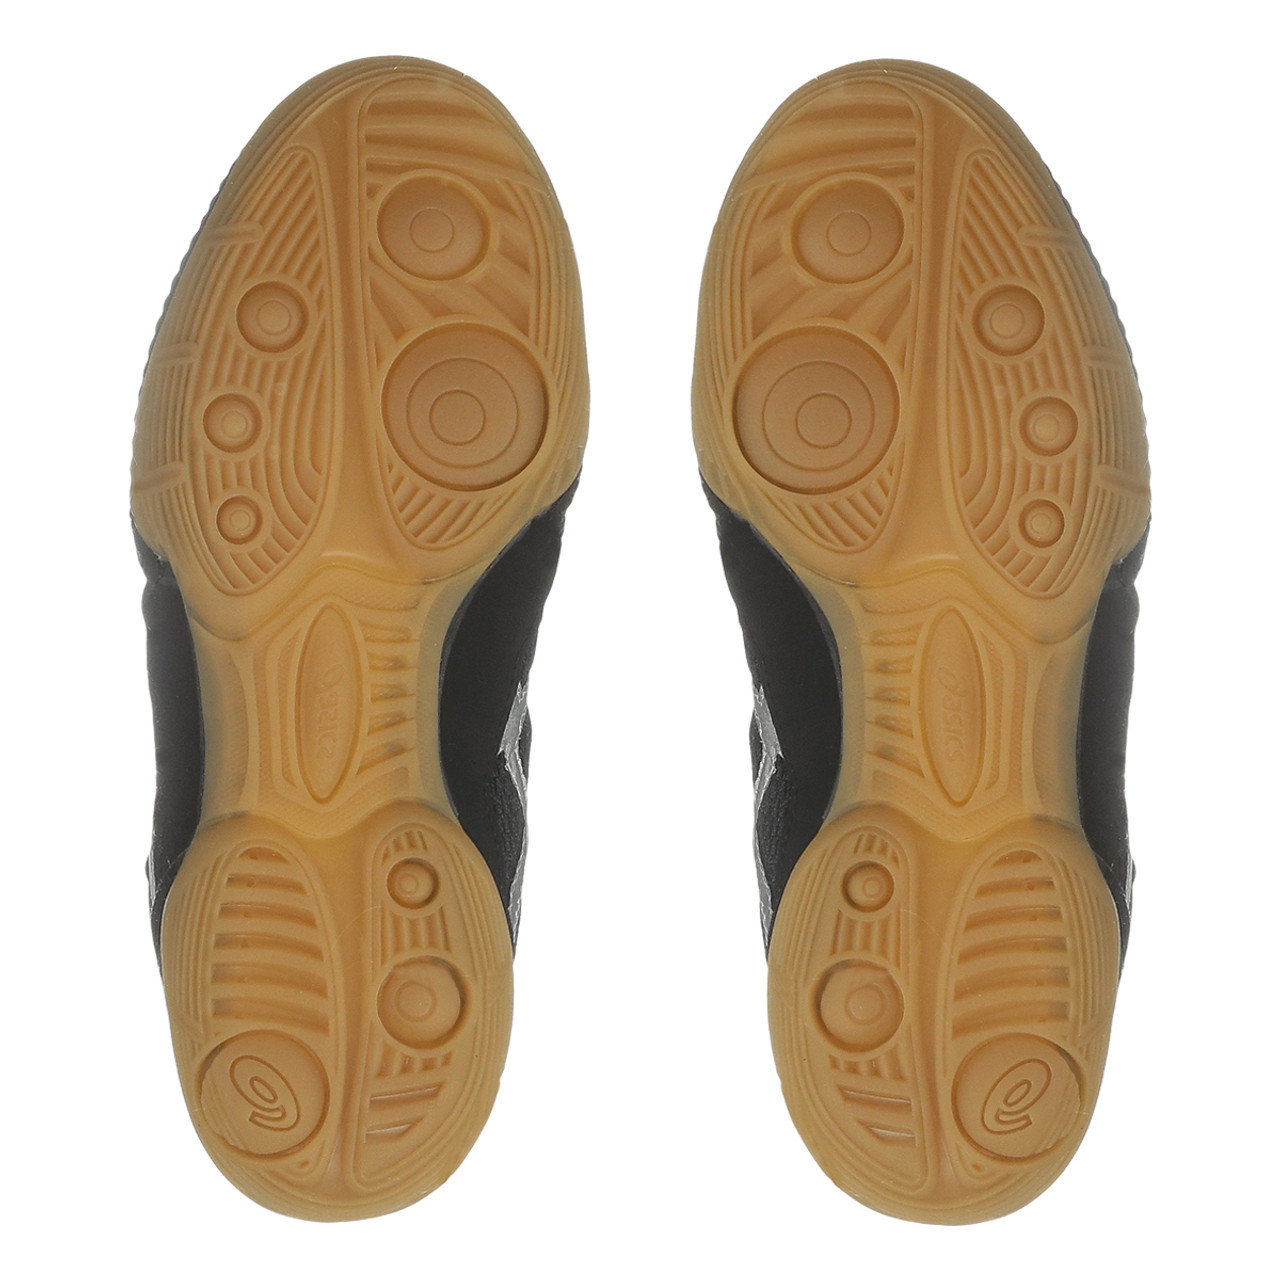 5 Matflex Asics Chaussures Gs Junior Catch ED9IeYWH2